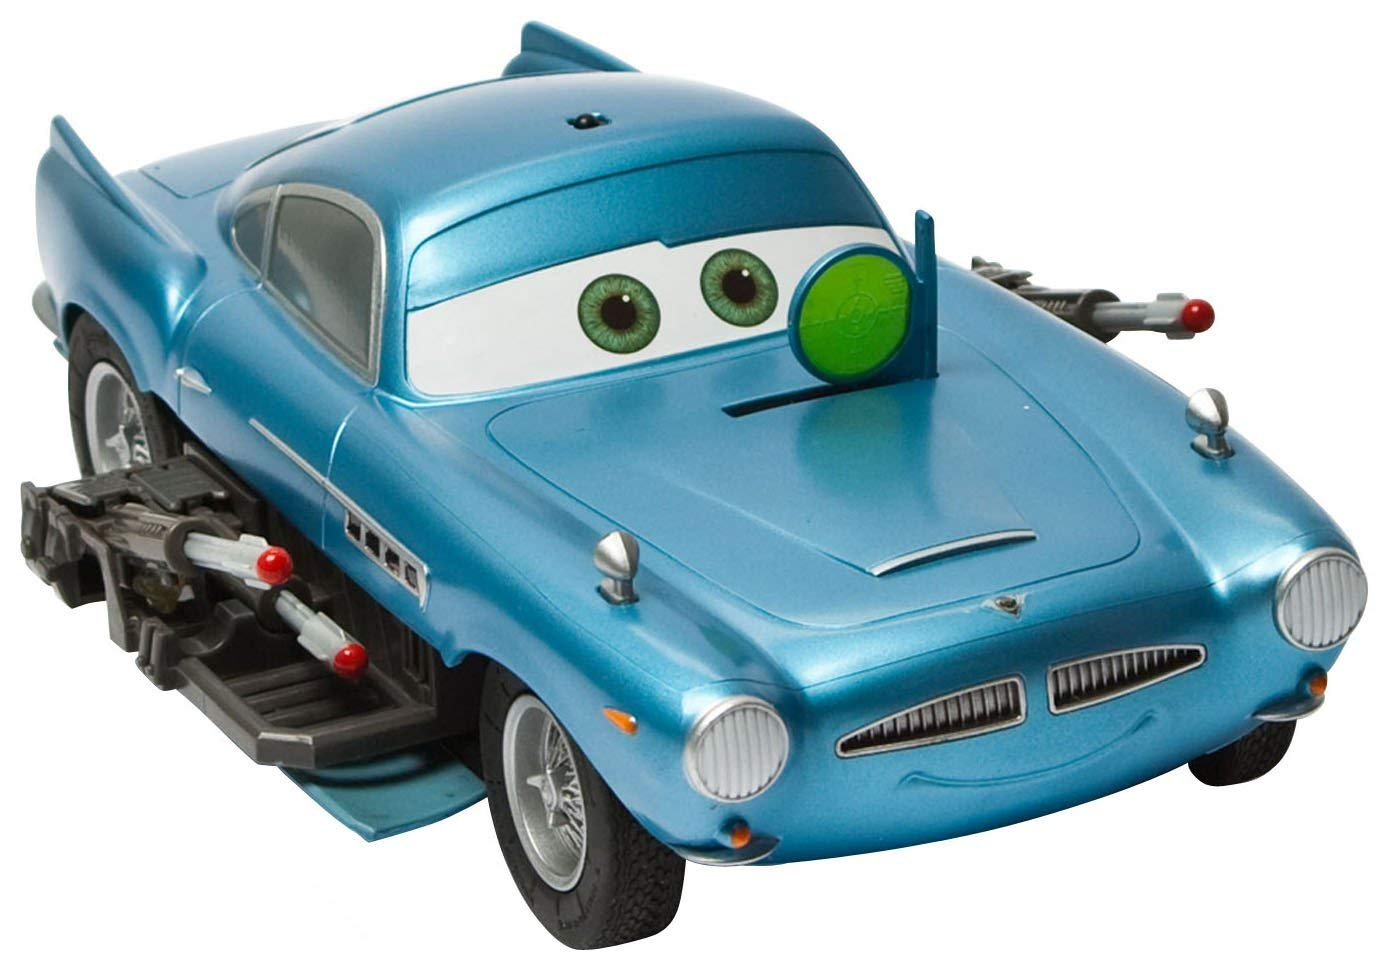 Air Hogs Cars 2 Missile Firing Finn McMissile by